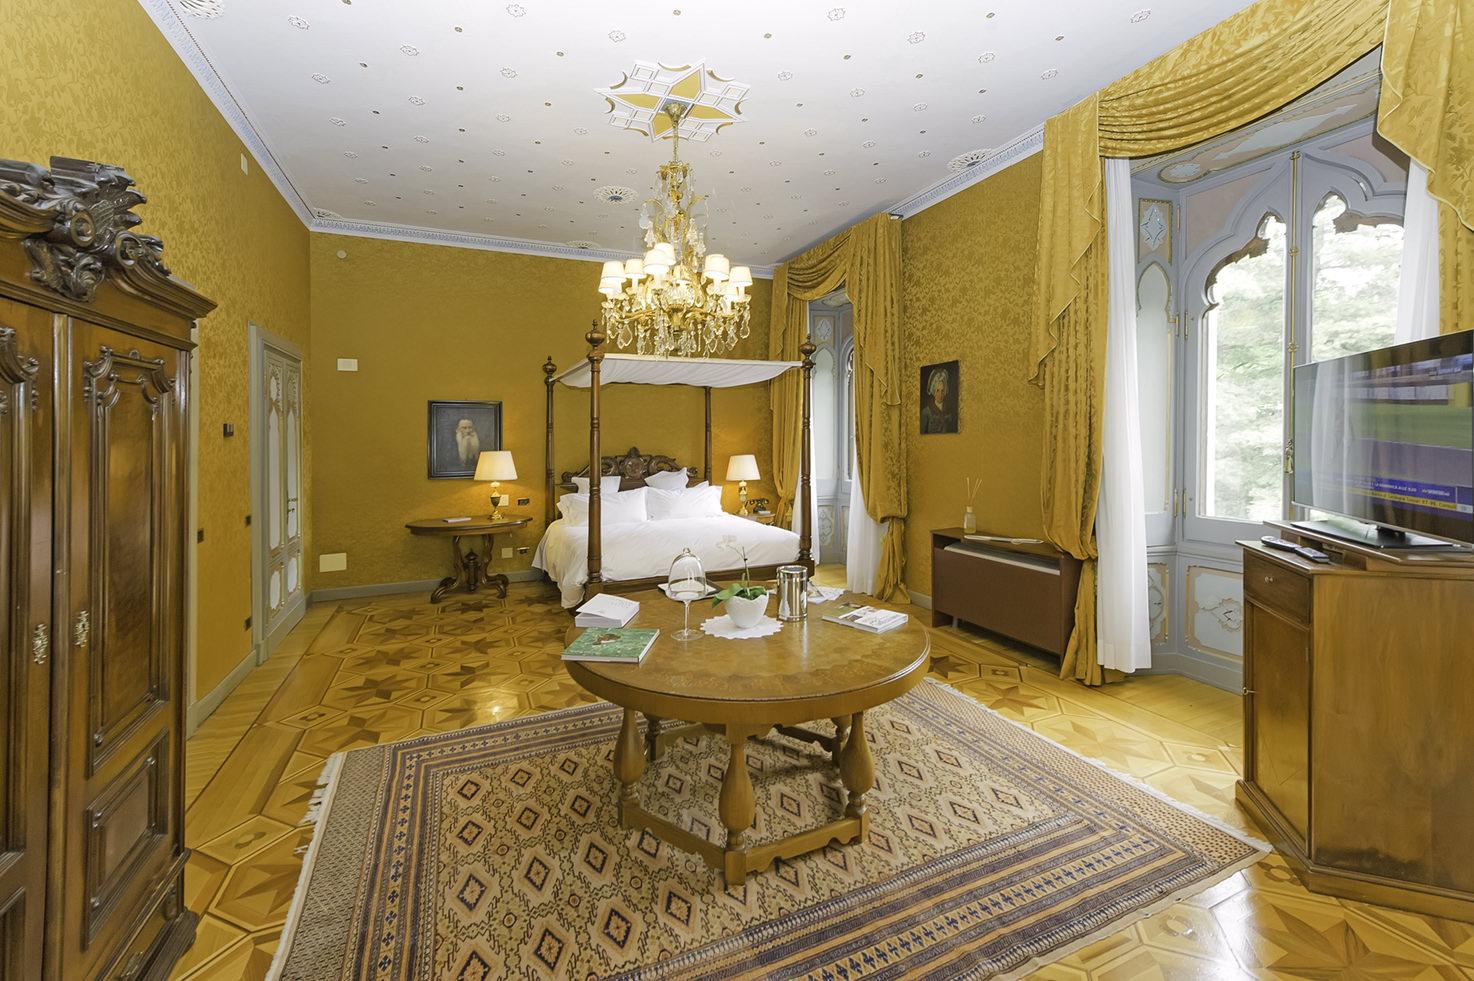 Deluxe bedroom at Villa Crespi